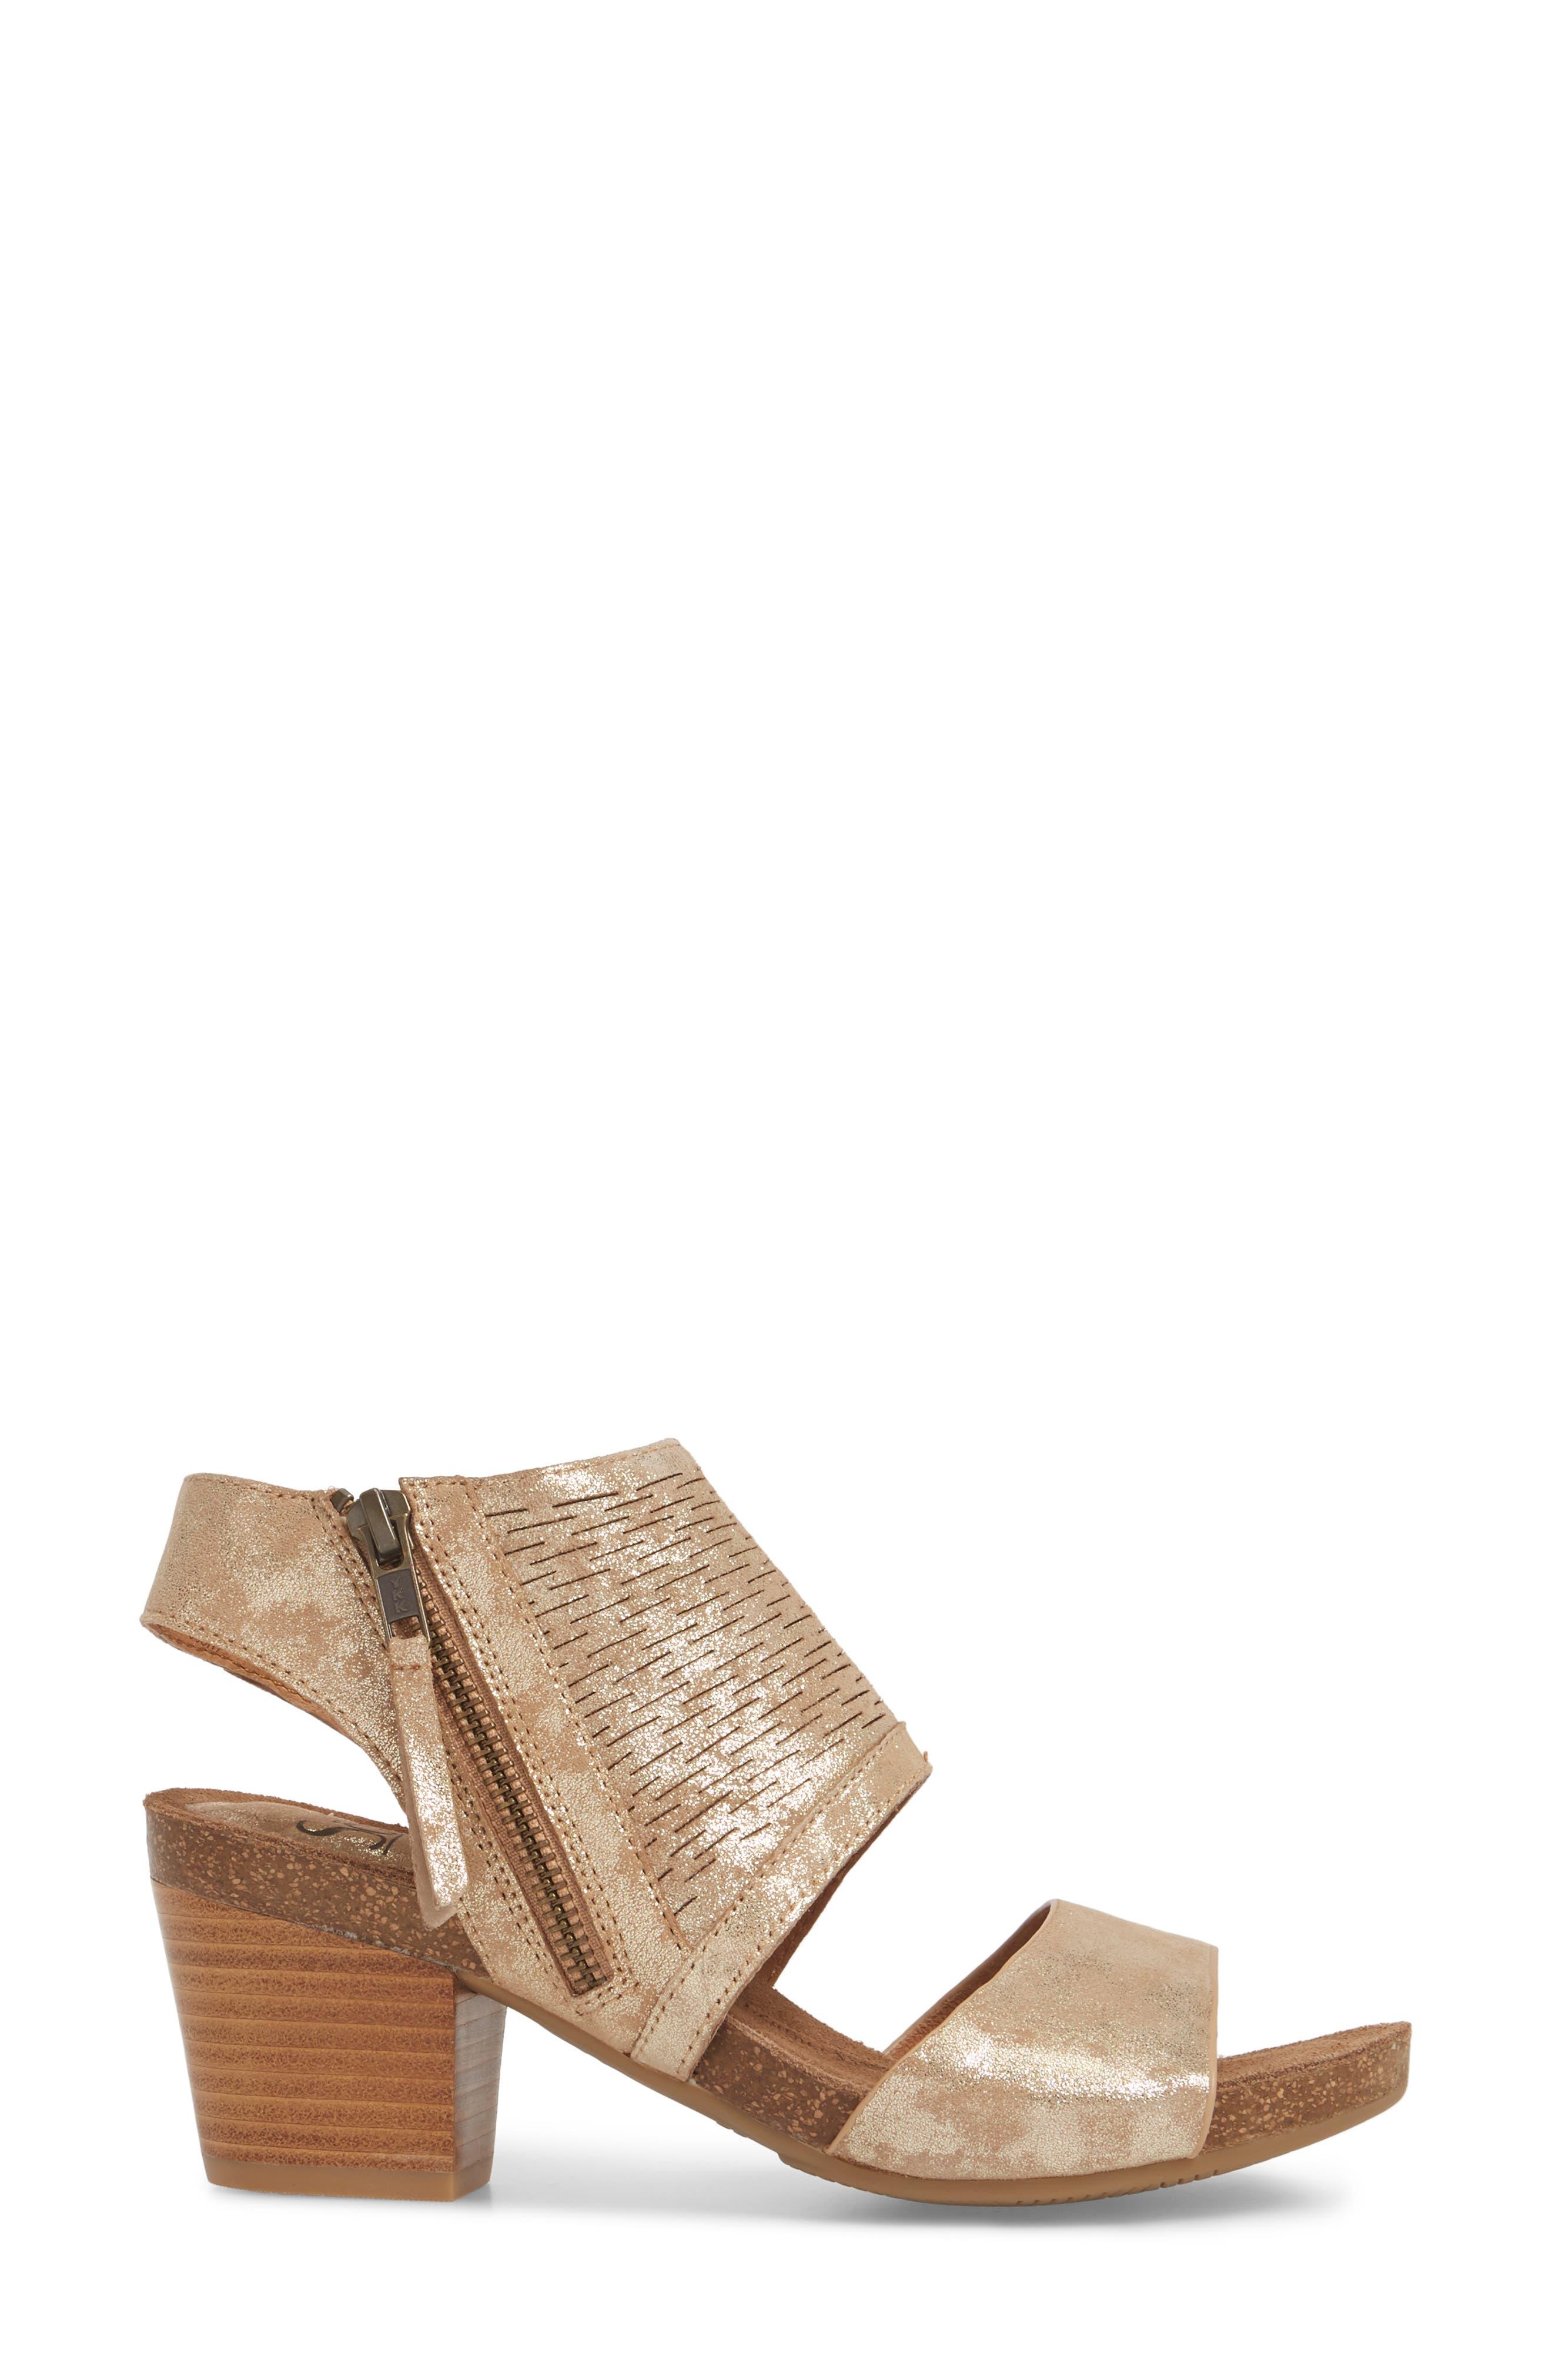 Milan Block Heel Sandal,                             Alternate thumbnail 3, color,                             040